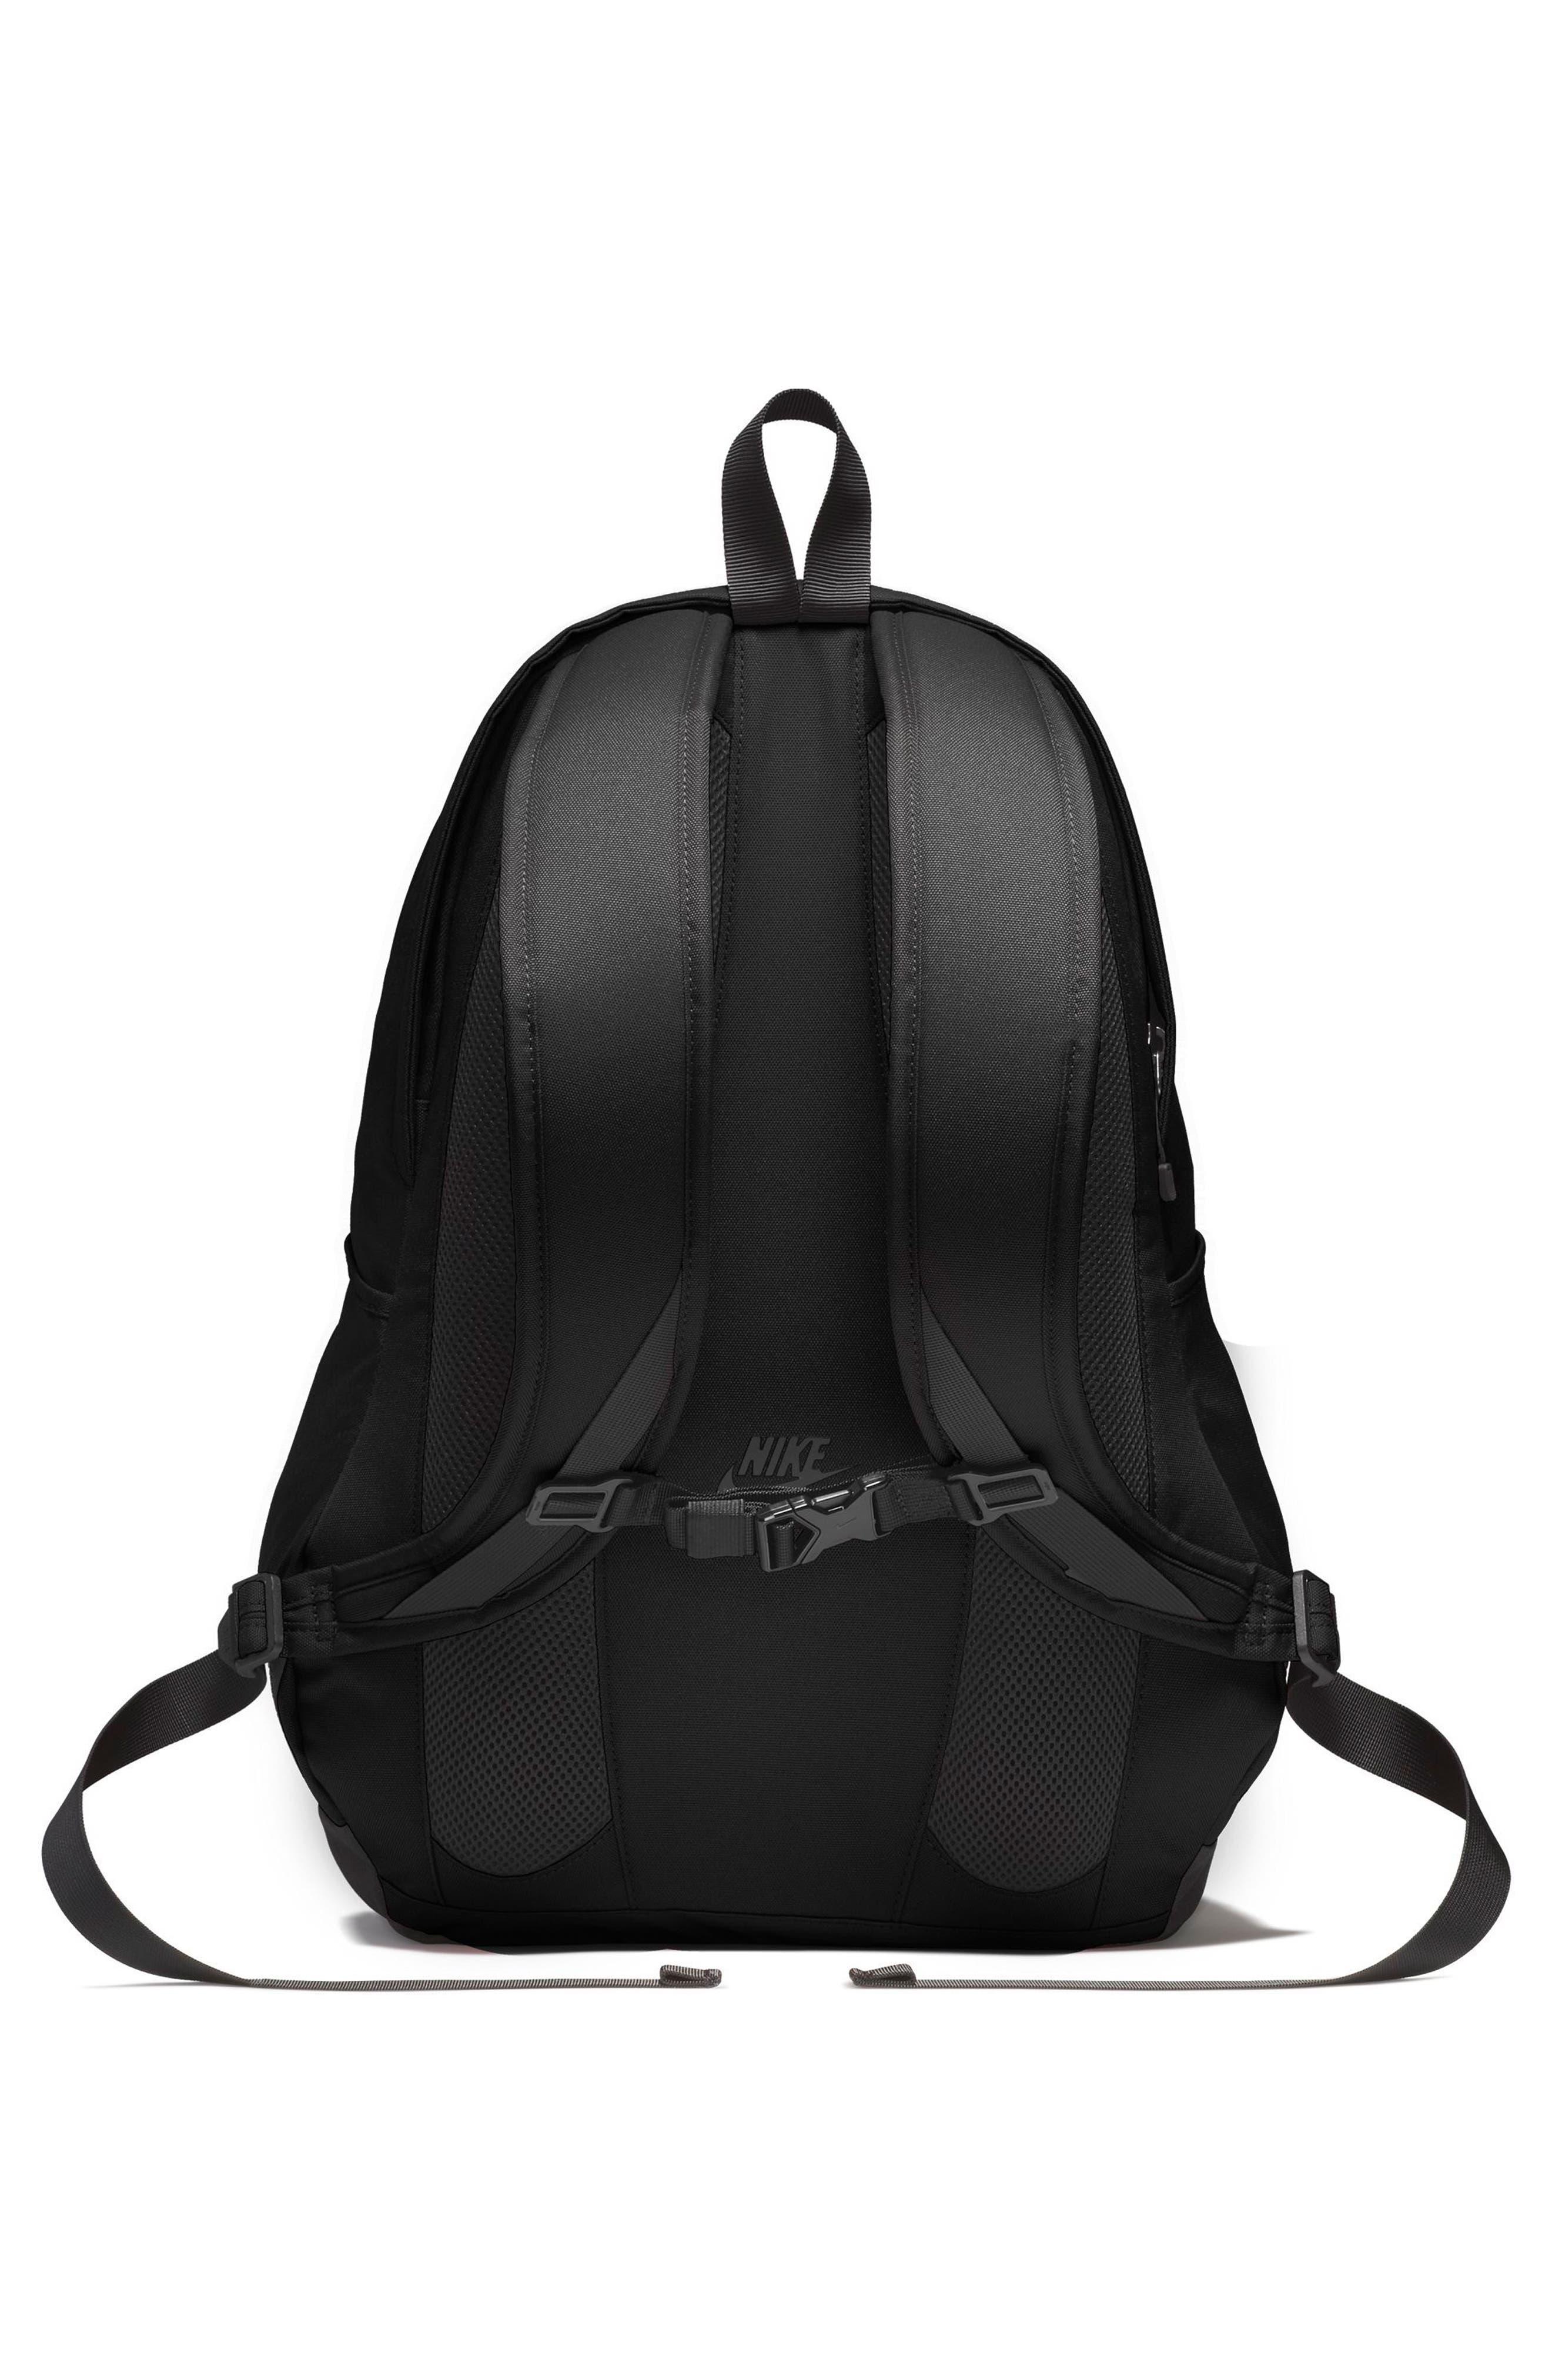 Cheyenne Backpack,                             Alternate thumbnail 2, color,                             Black/ Black/ Black